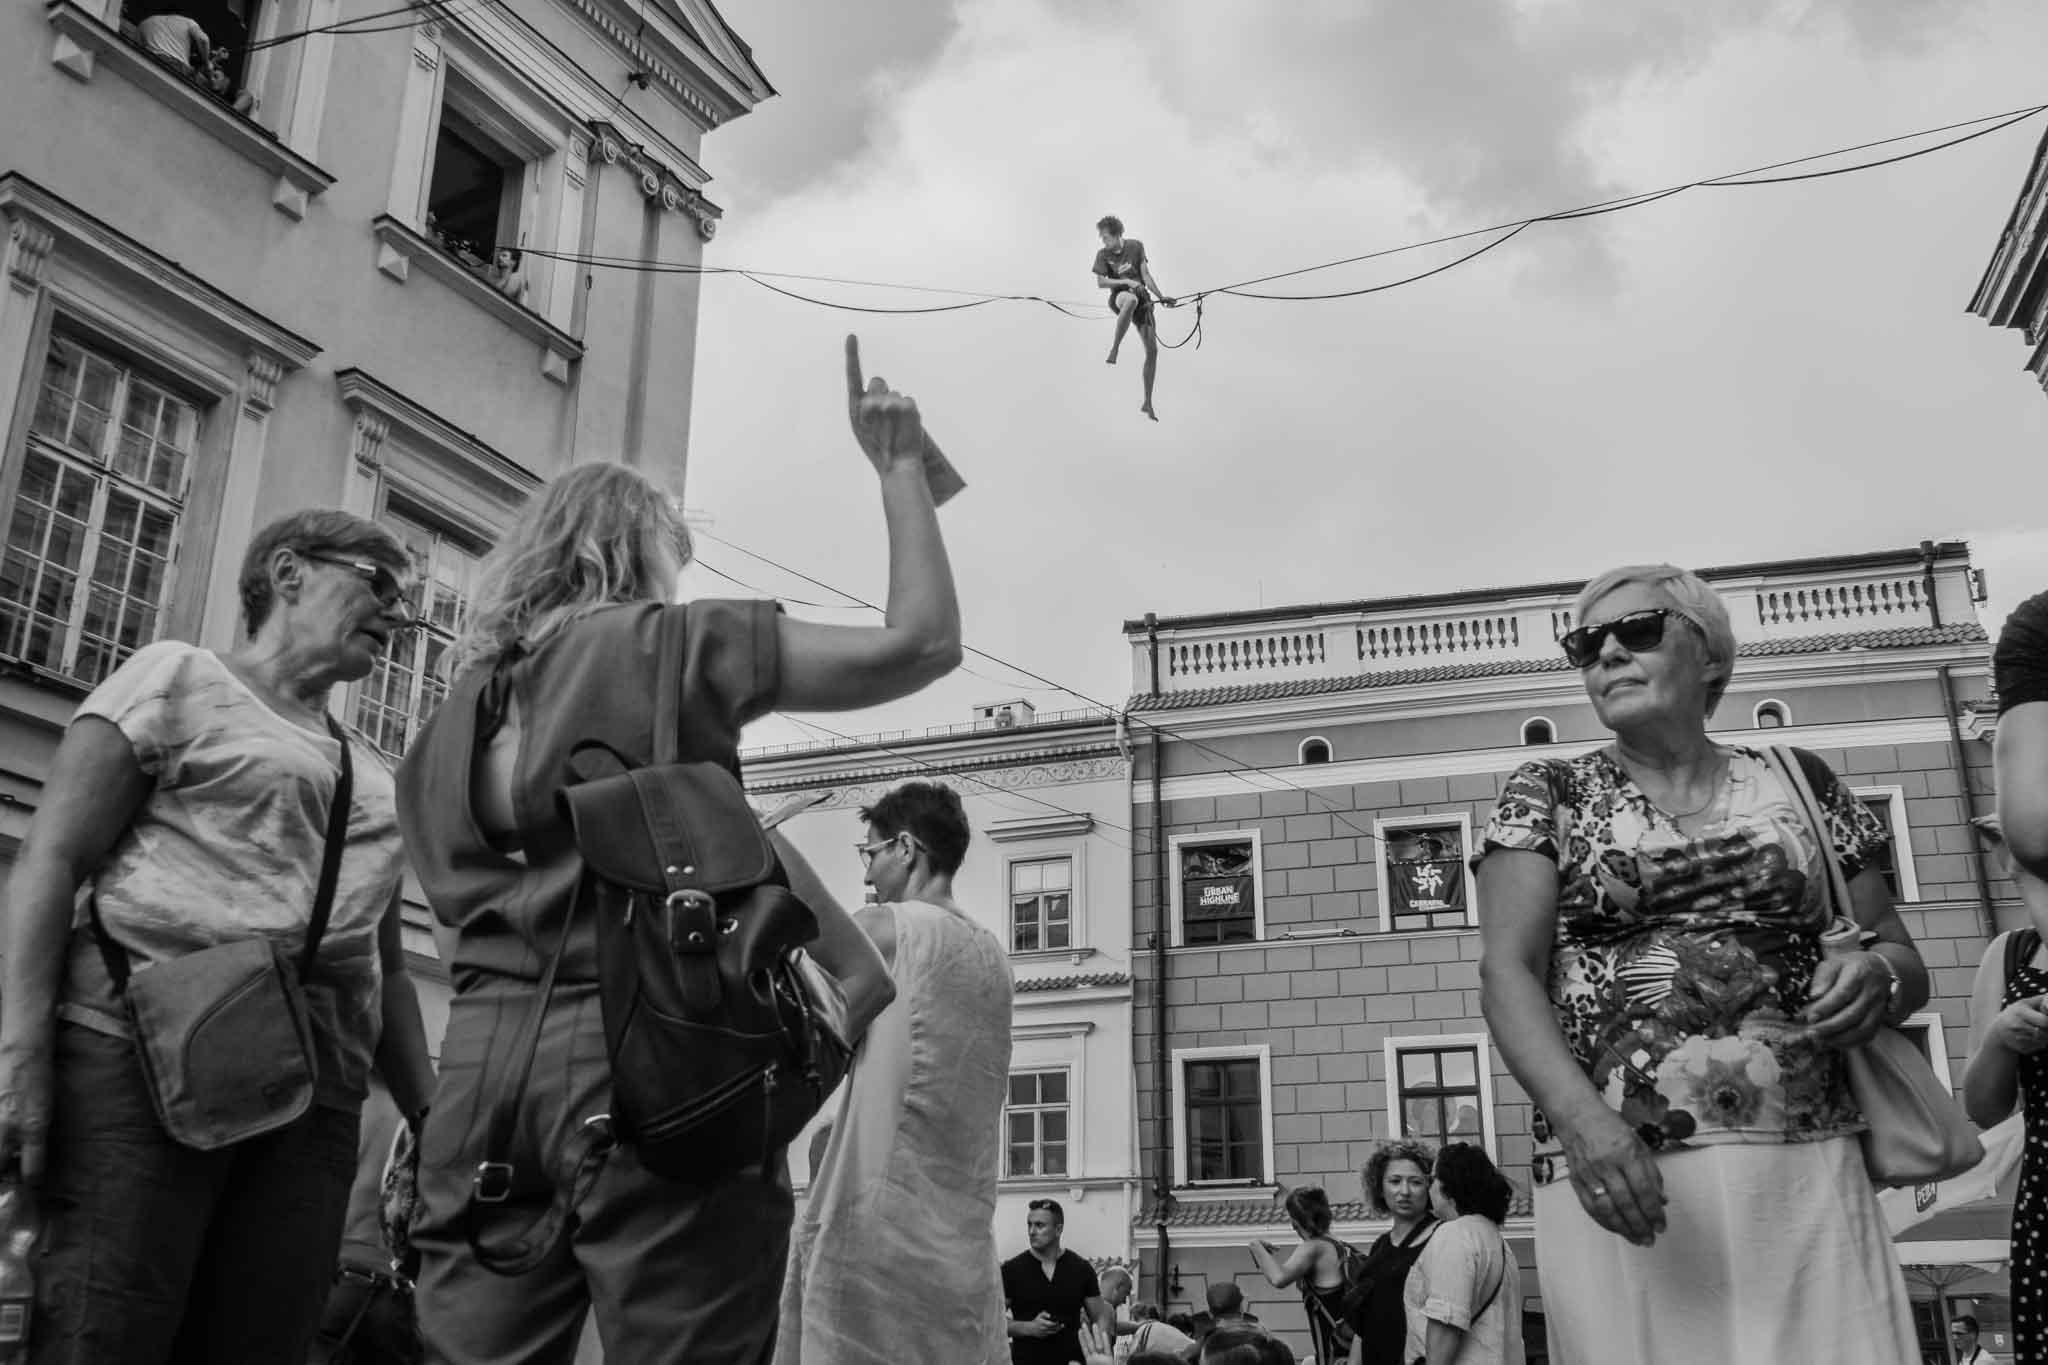 fotografia uliczna inspiracje